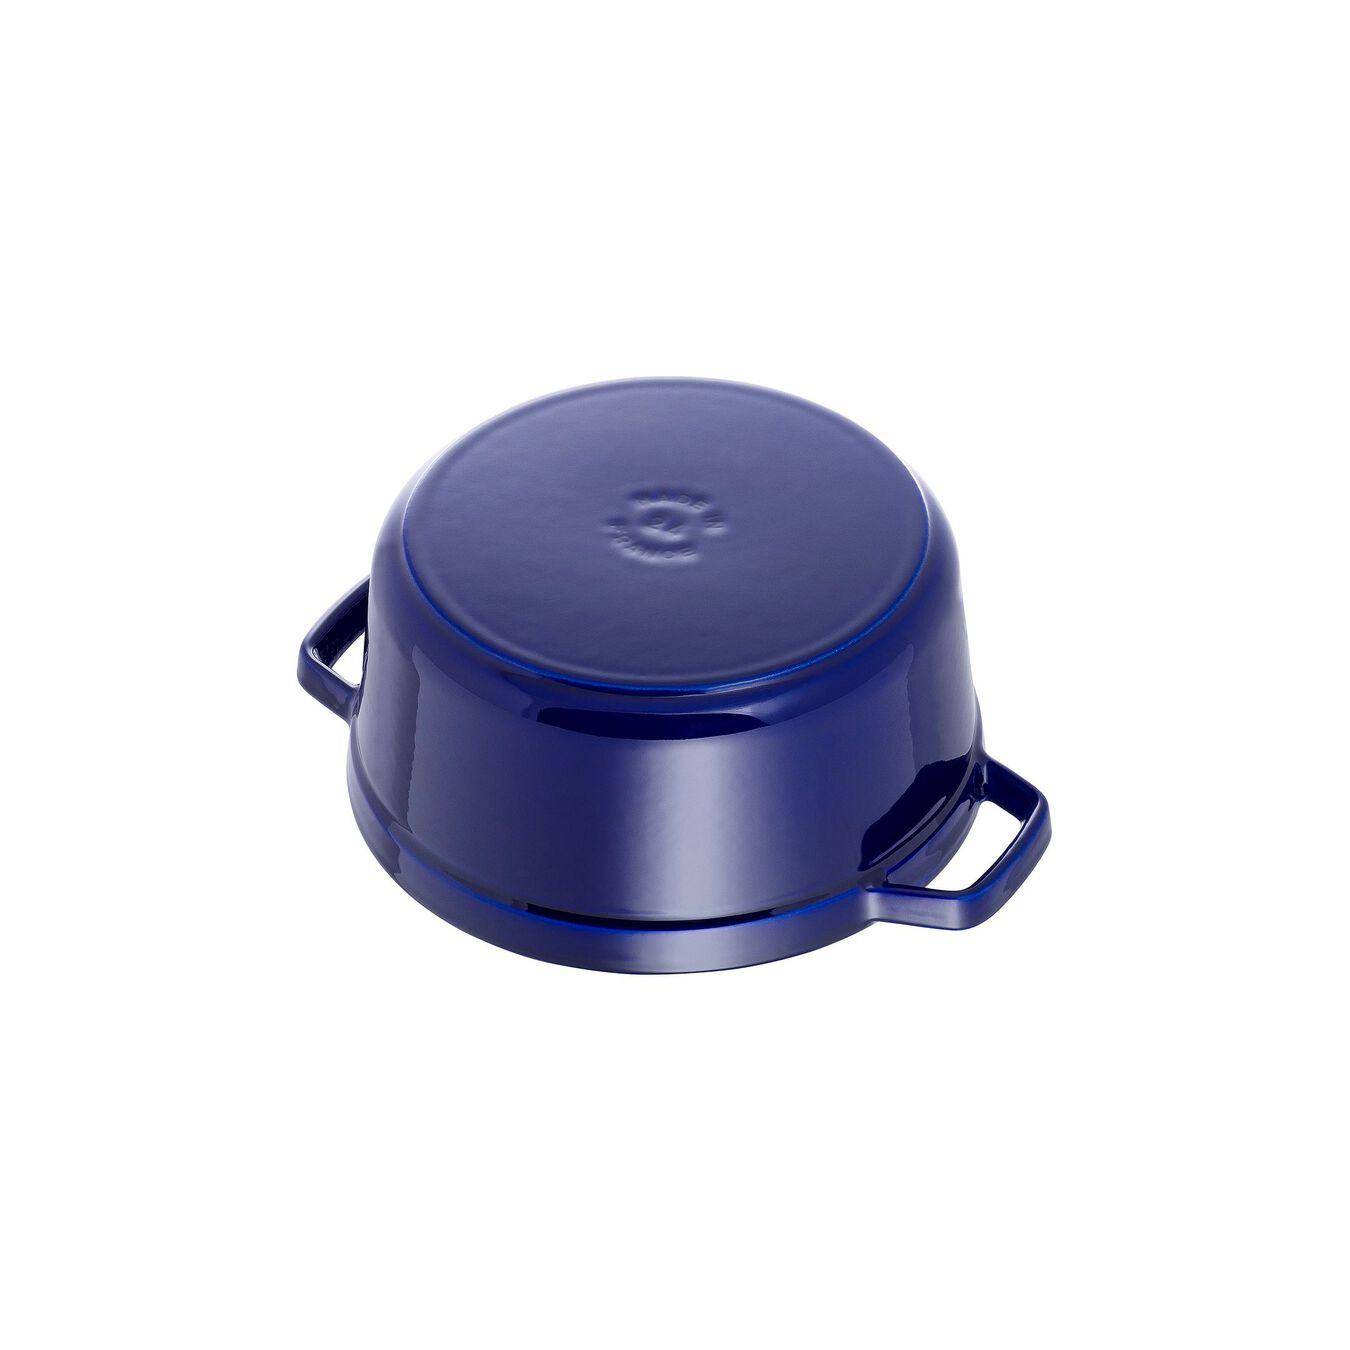 4-qt Round Cocotte - Dark Blue,,large 3